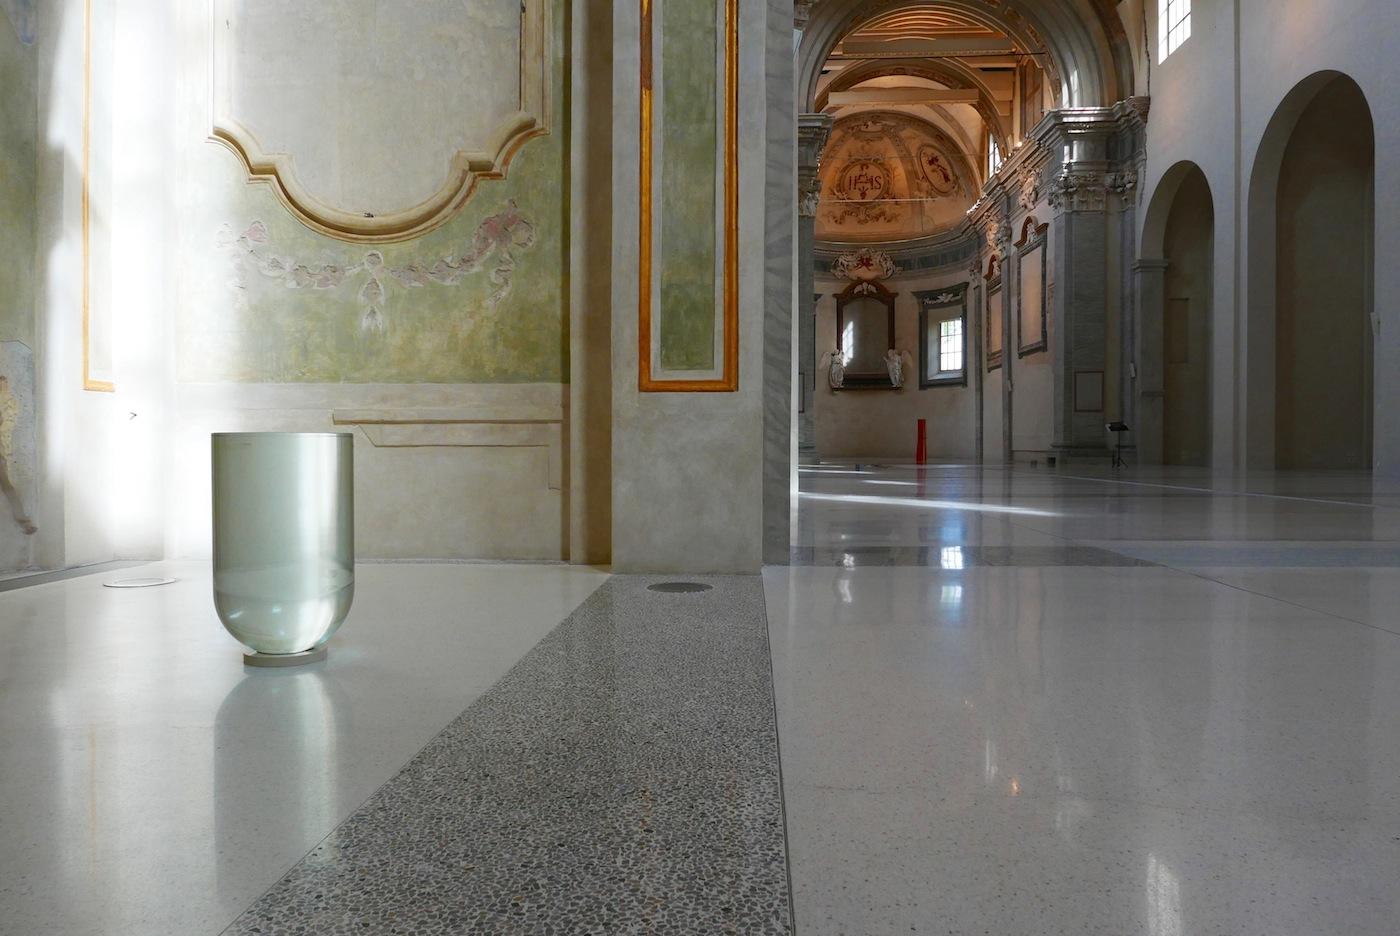 Lente liquida 1996-1998 , acqua, vetro, sughero, cm 70 x 41,5 ∅ Courtesy Christian Stein, Milano. © Luca Massari